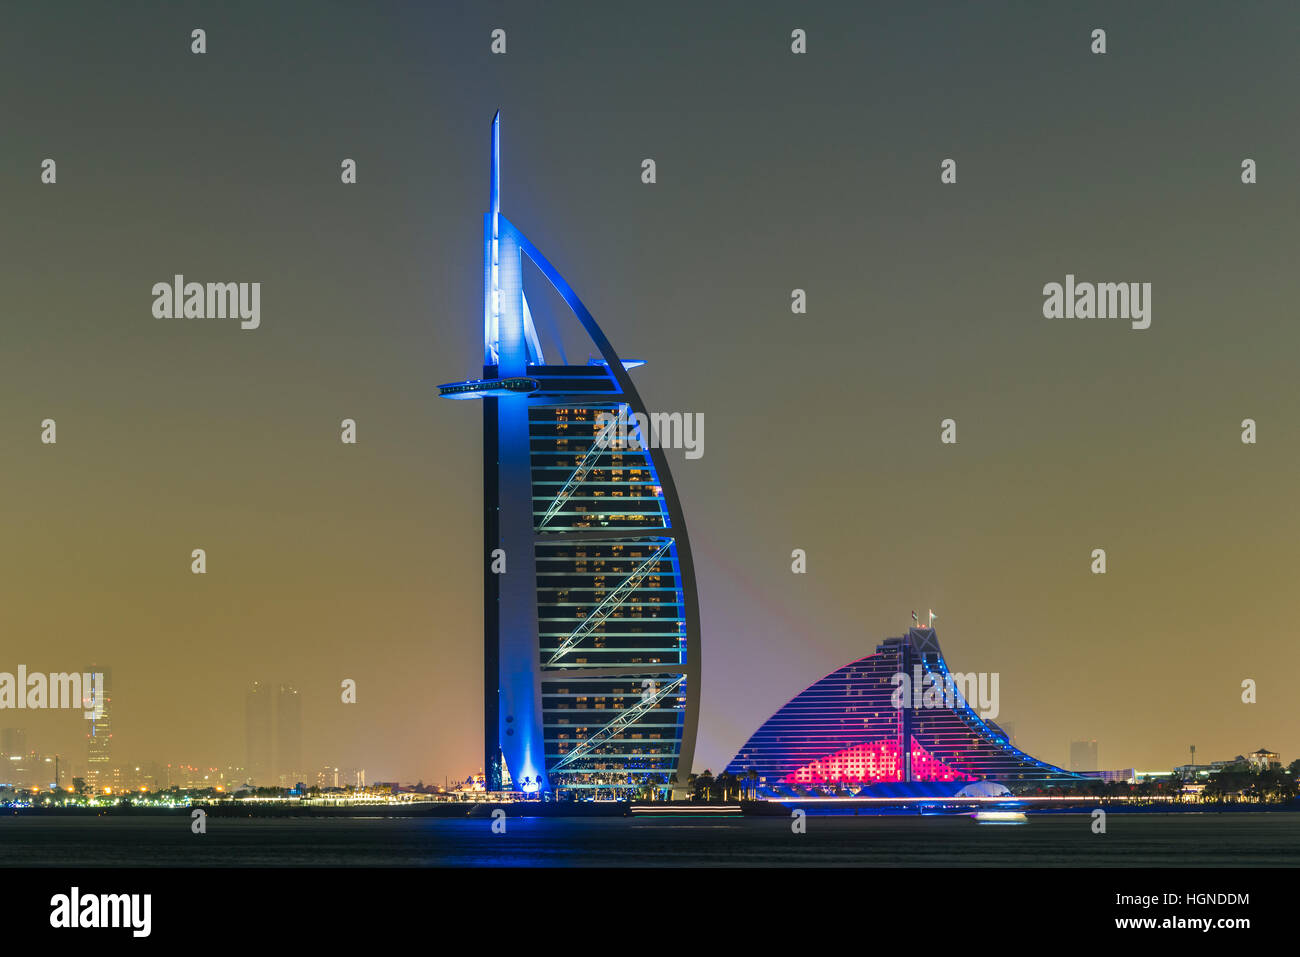 Vista notturna di Burj Al Arab e Jumeirah Beach Hotel, Dubai, Emirati Arabi Uniti Immagini Stock